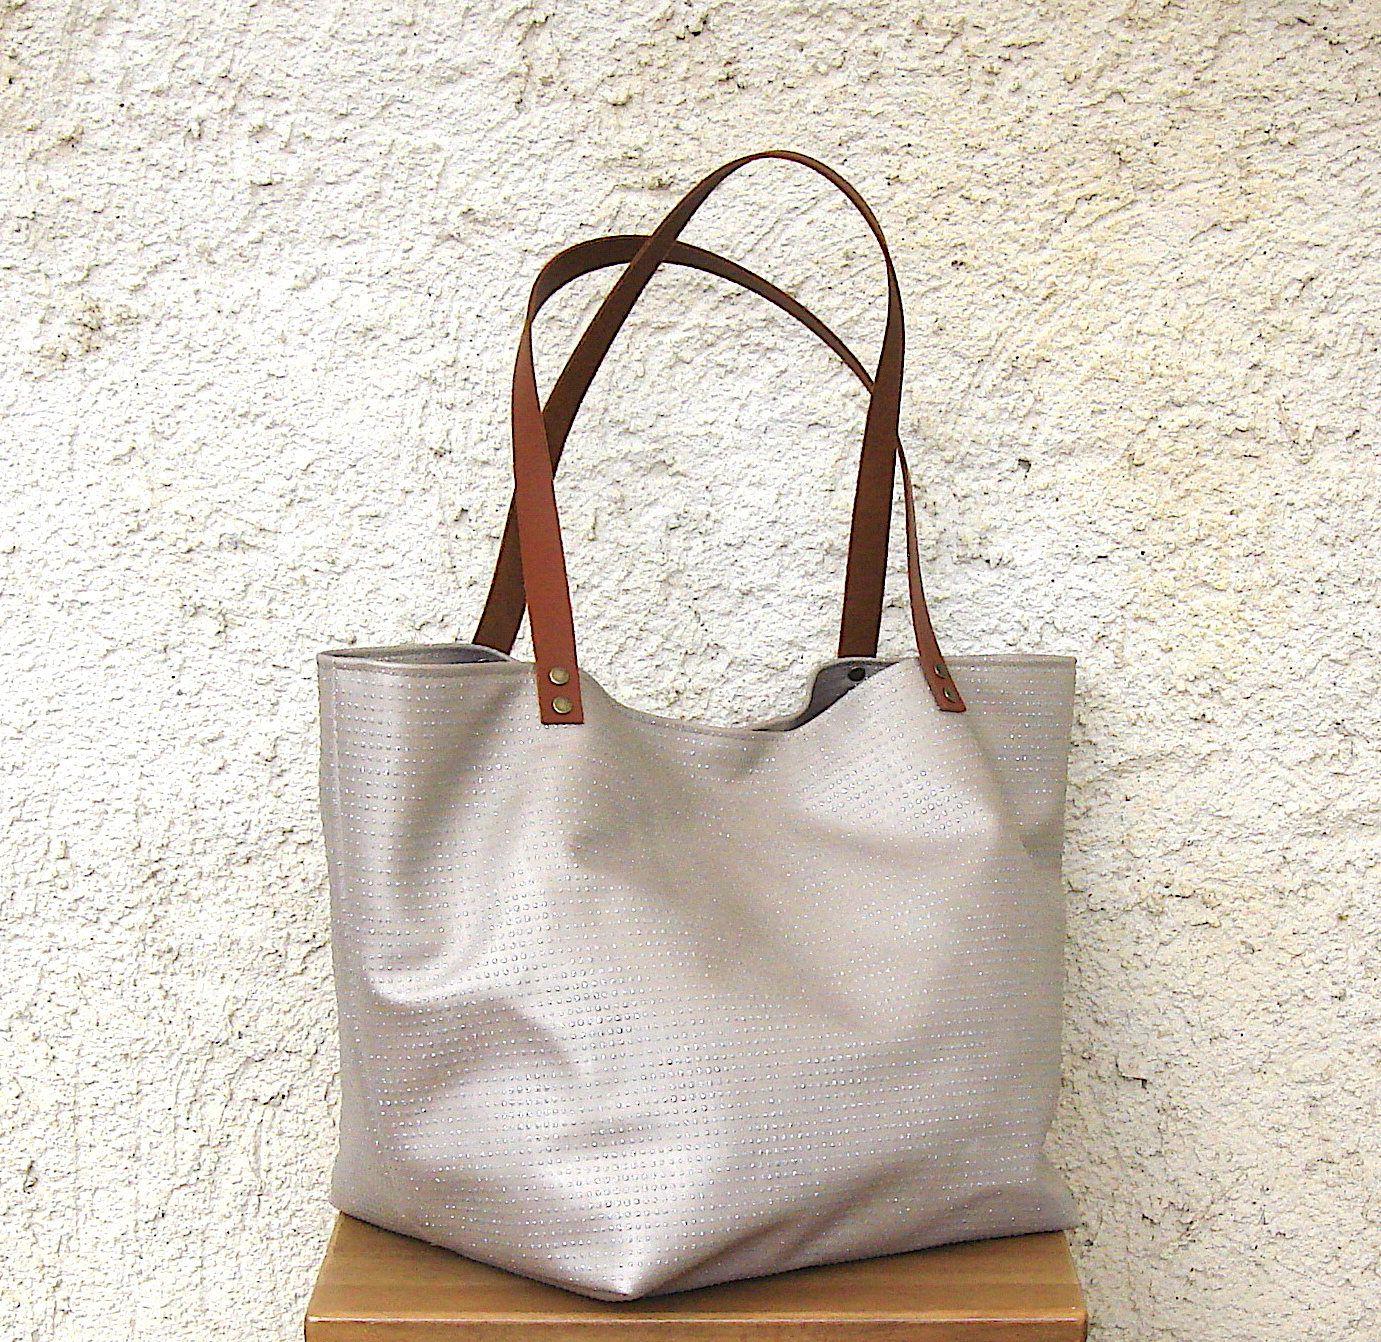 Tote bag faux leather rhinestone, bag handles in leather, beige tote bag,  tote bag, tote bag, XL, large tote bag, handmade in France   Fausse, Sac  cabas et ... 996413c932f